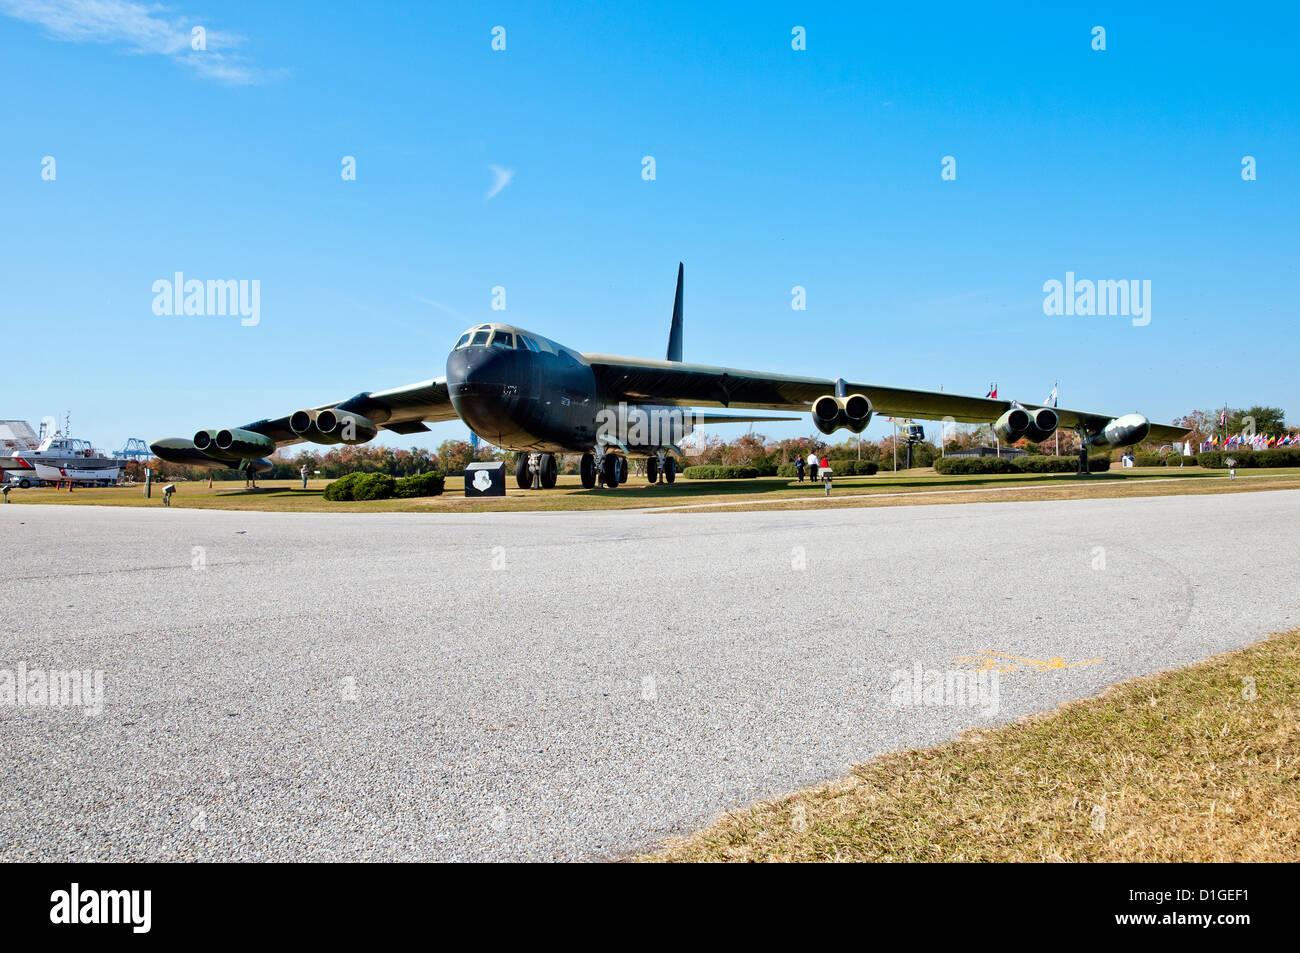 B-52 Stratofortress 'Calamity Jane'in avant,Battleship Memorial Park, Mobile, Alabama Banque D'Images